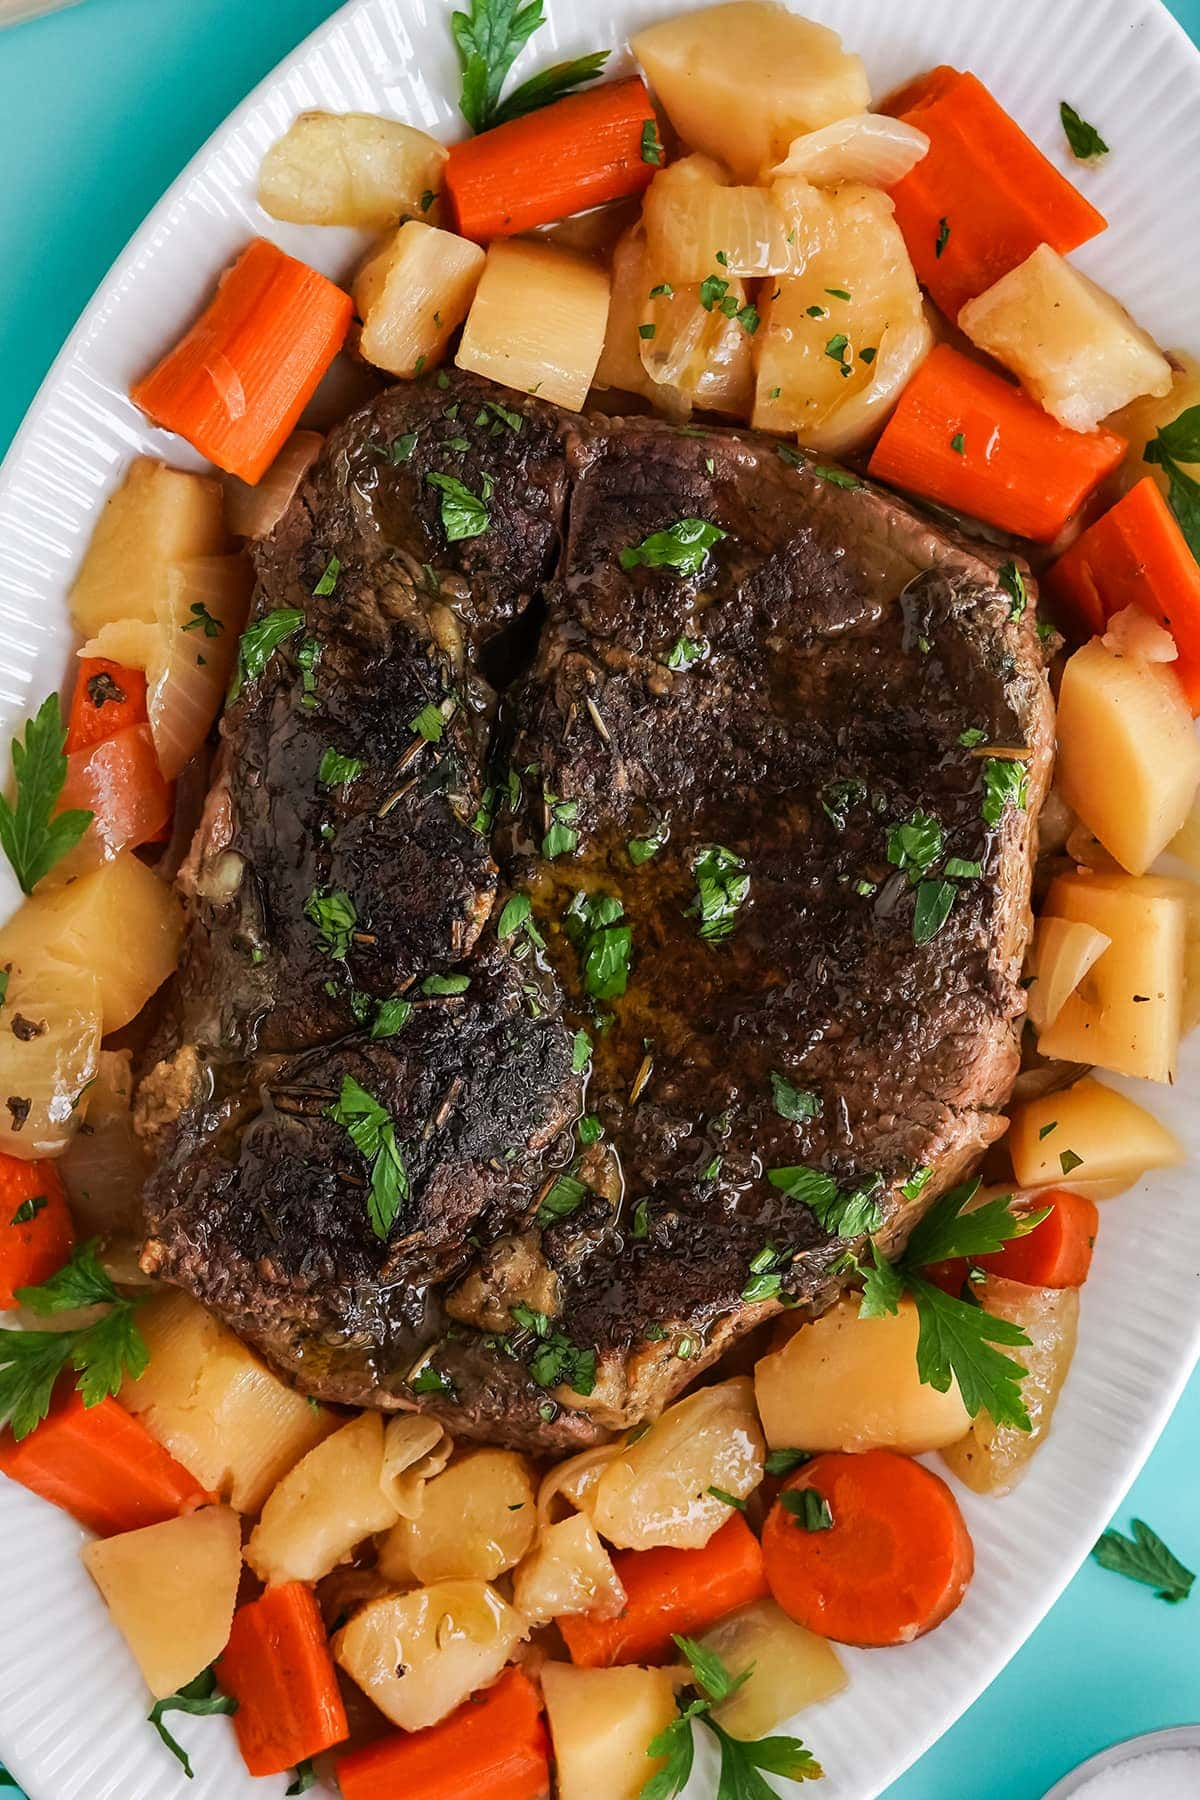 chuck roast, carrots, onions, potatoes on white serving platter